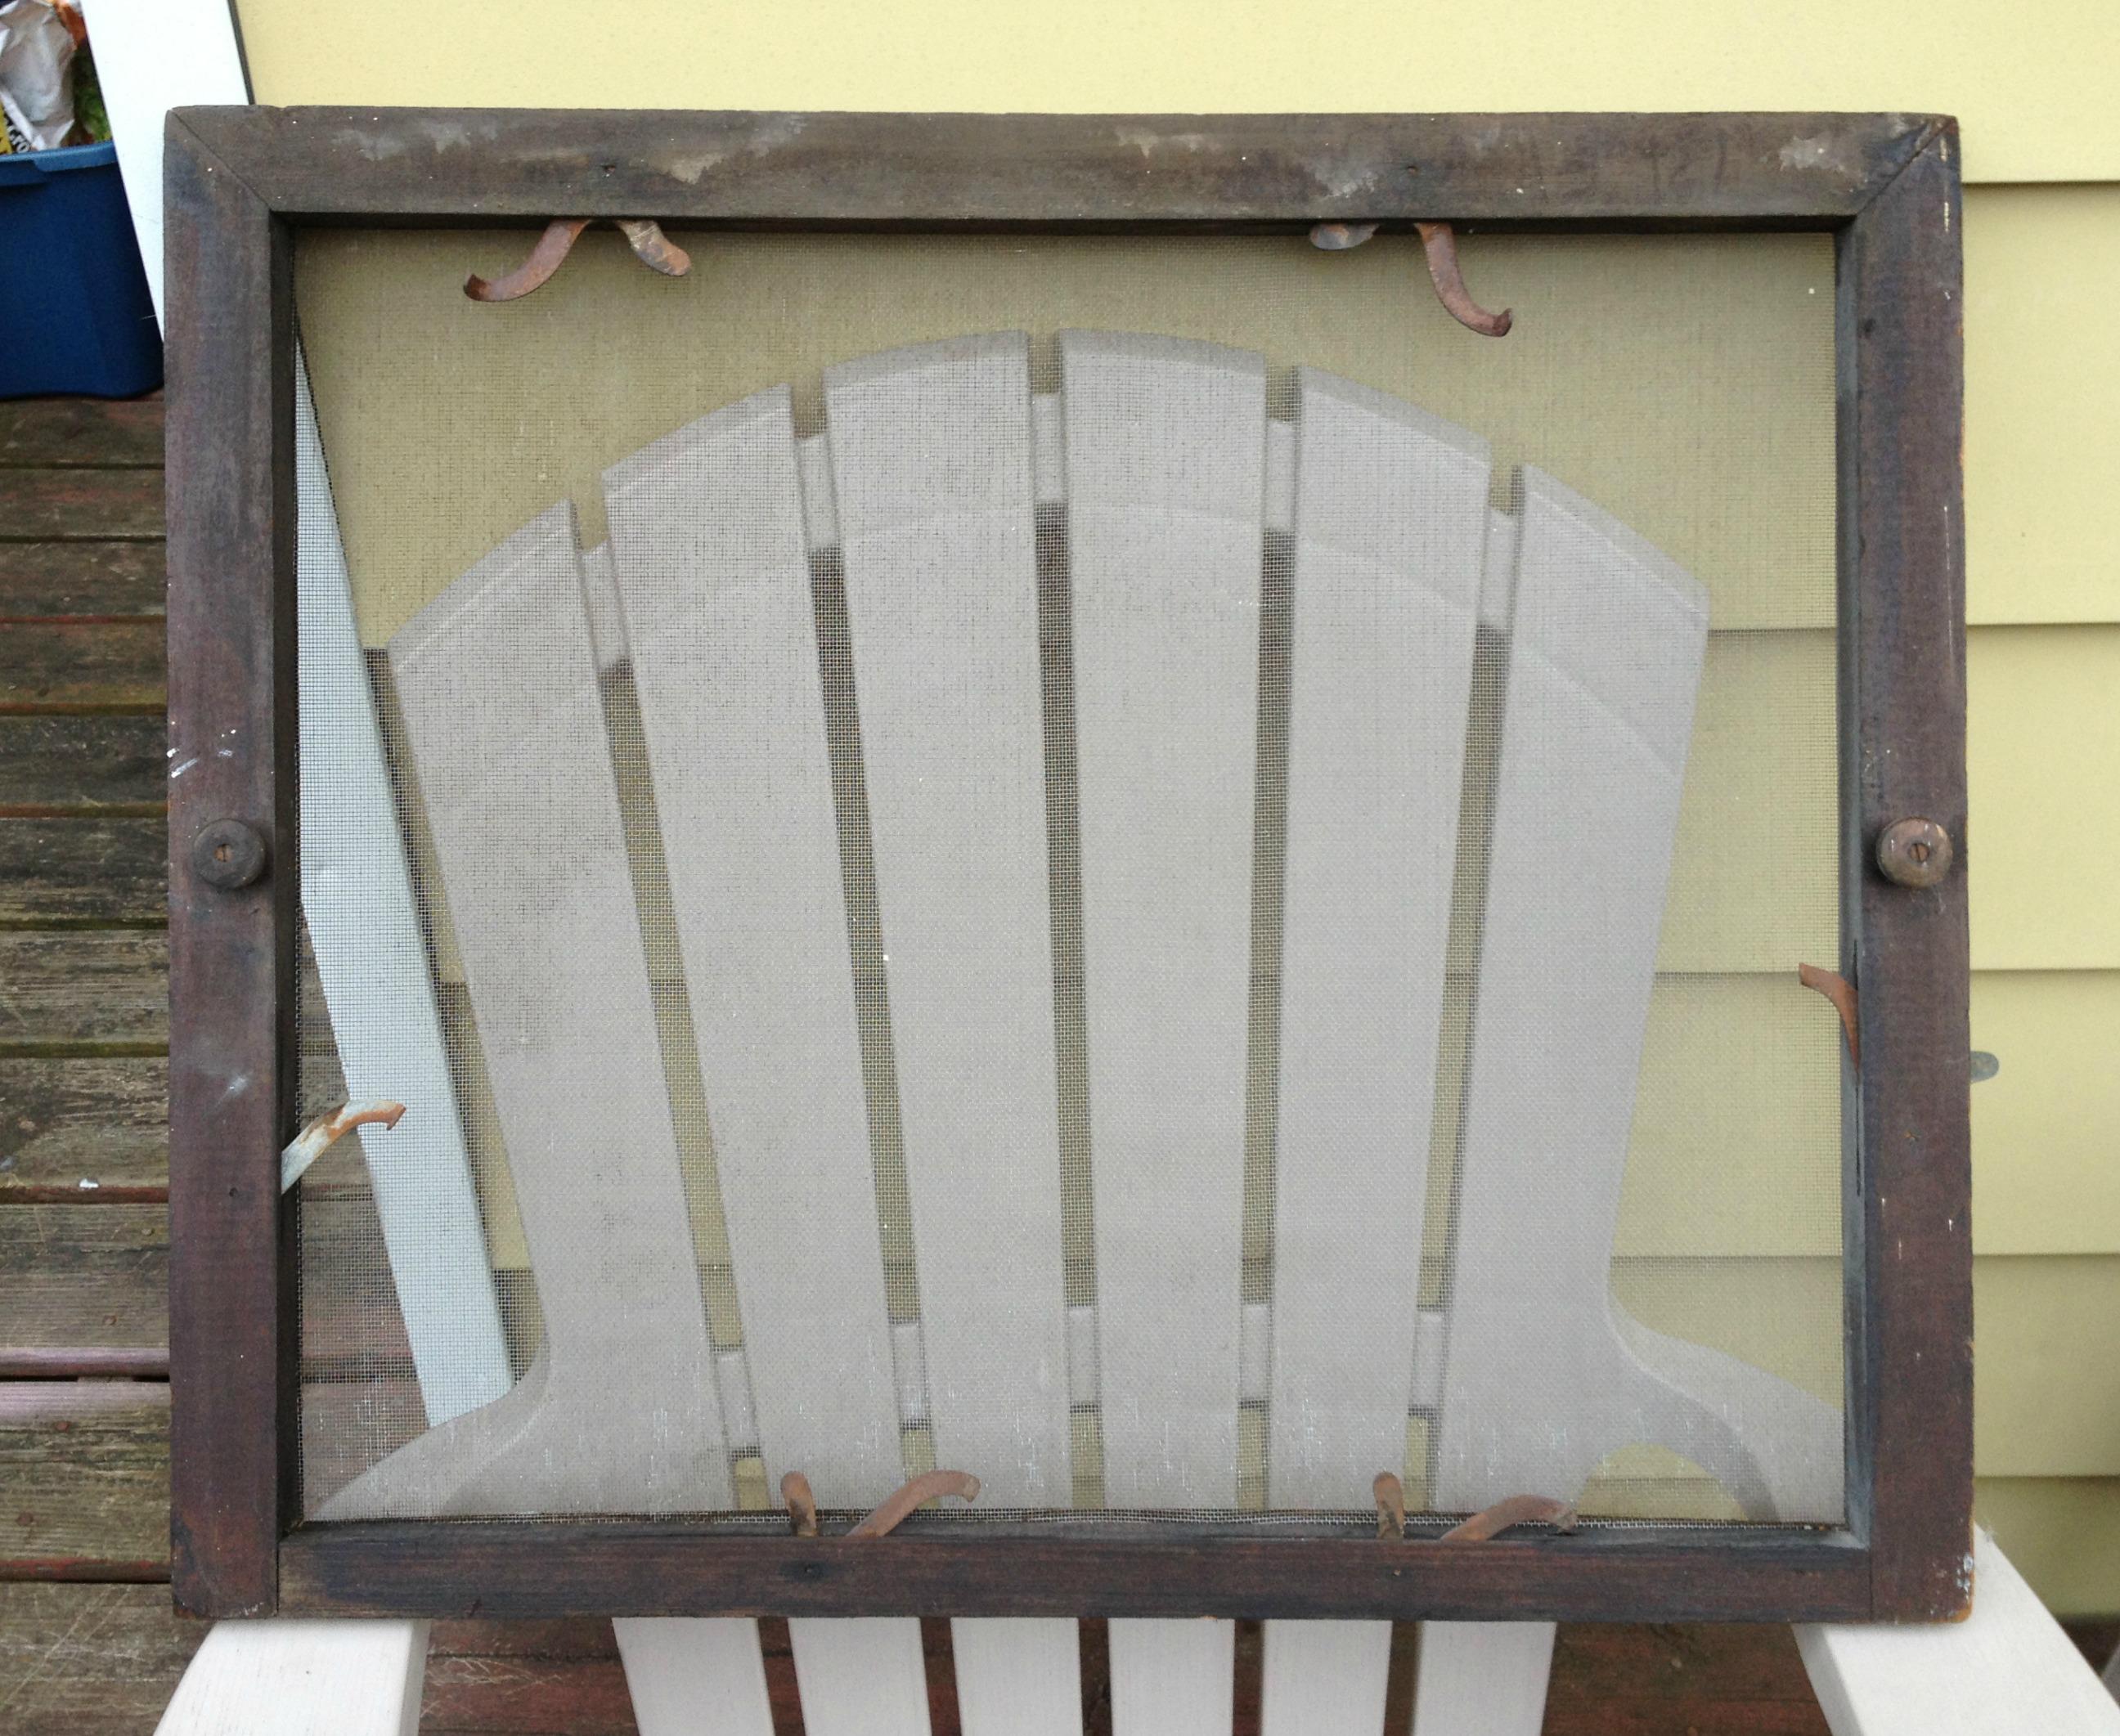 Murphys Oil Soap Uses >> Repurposing Old Windows